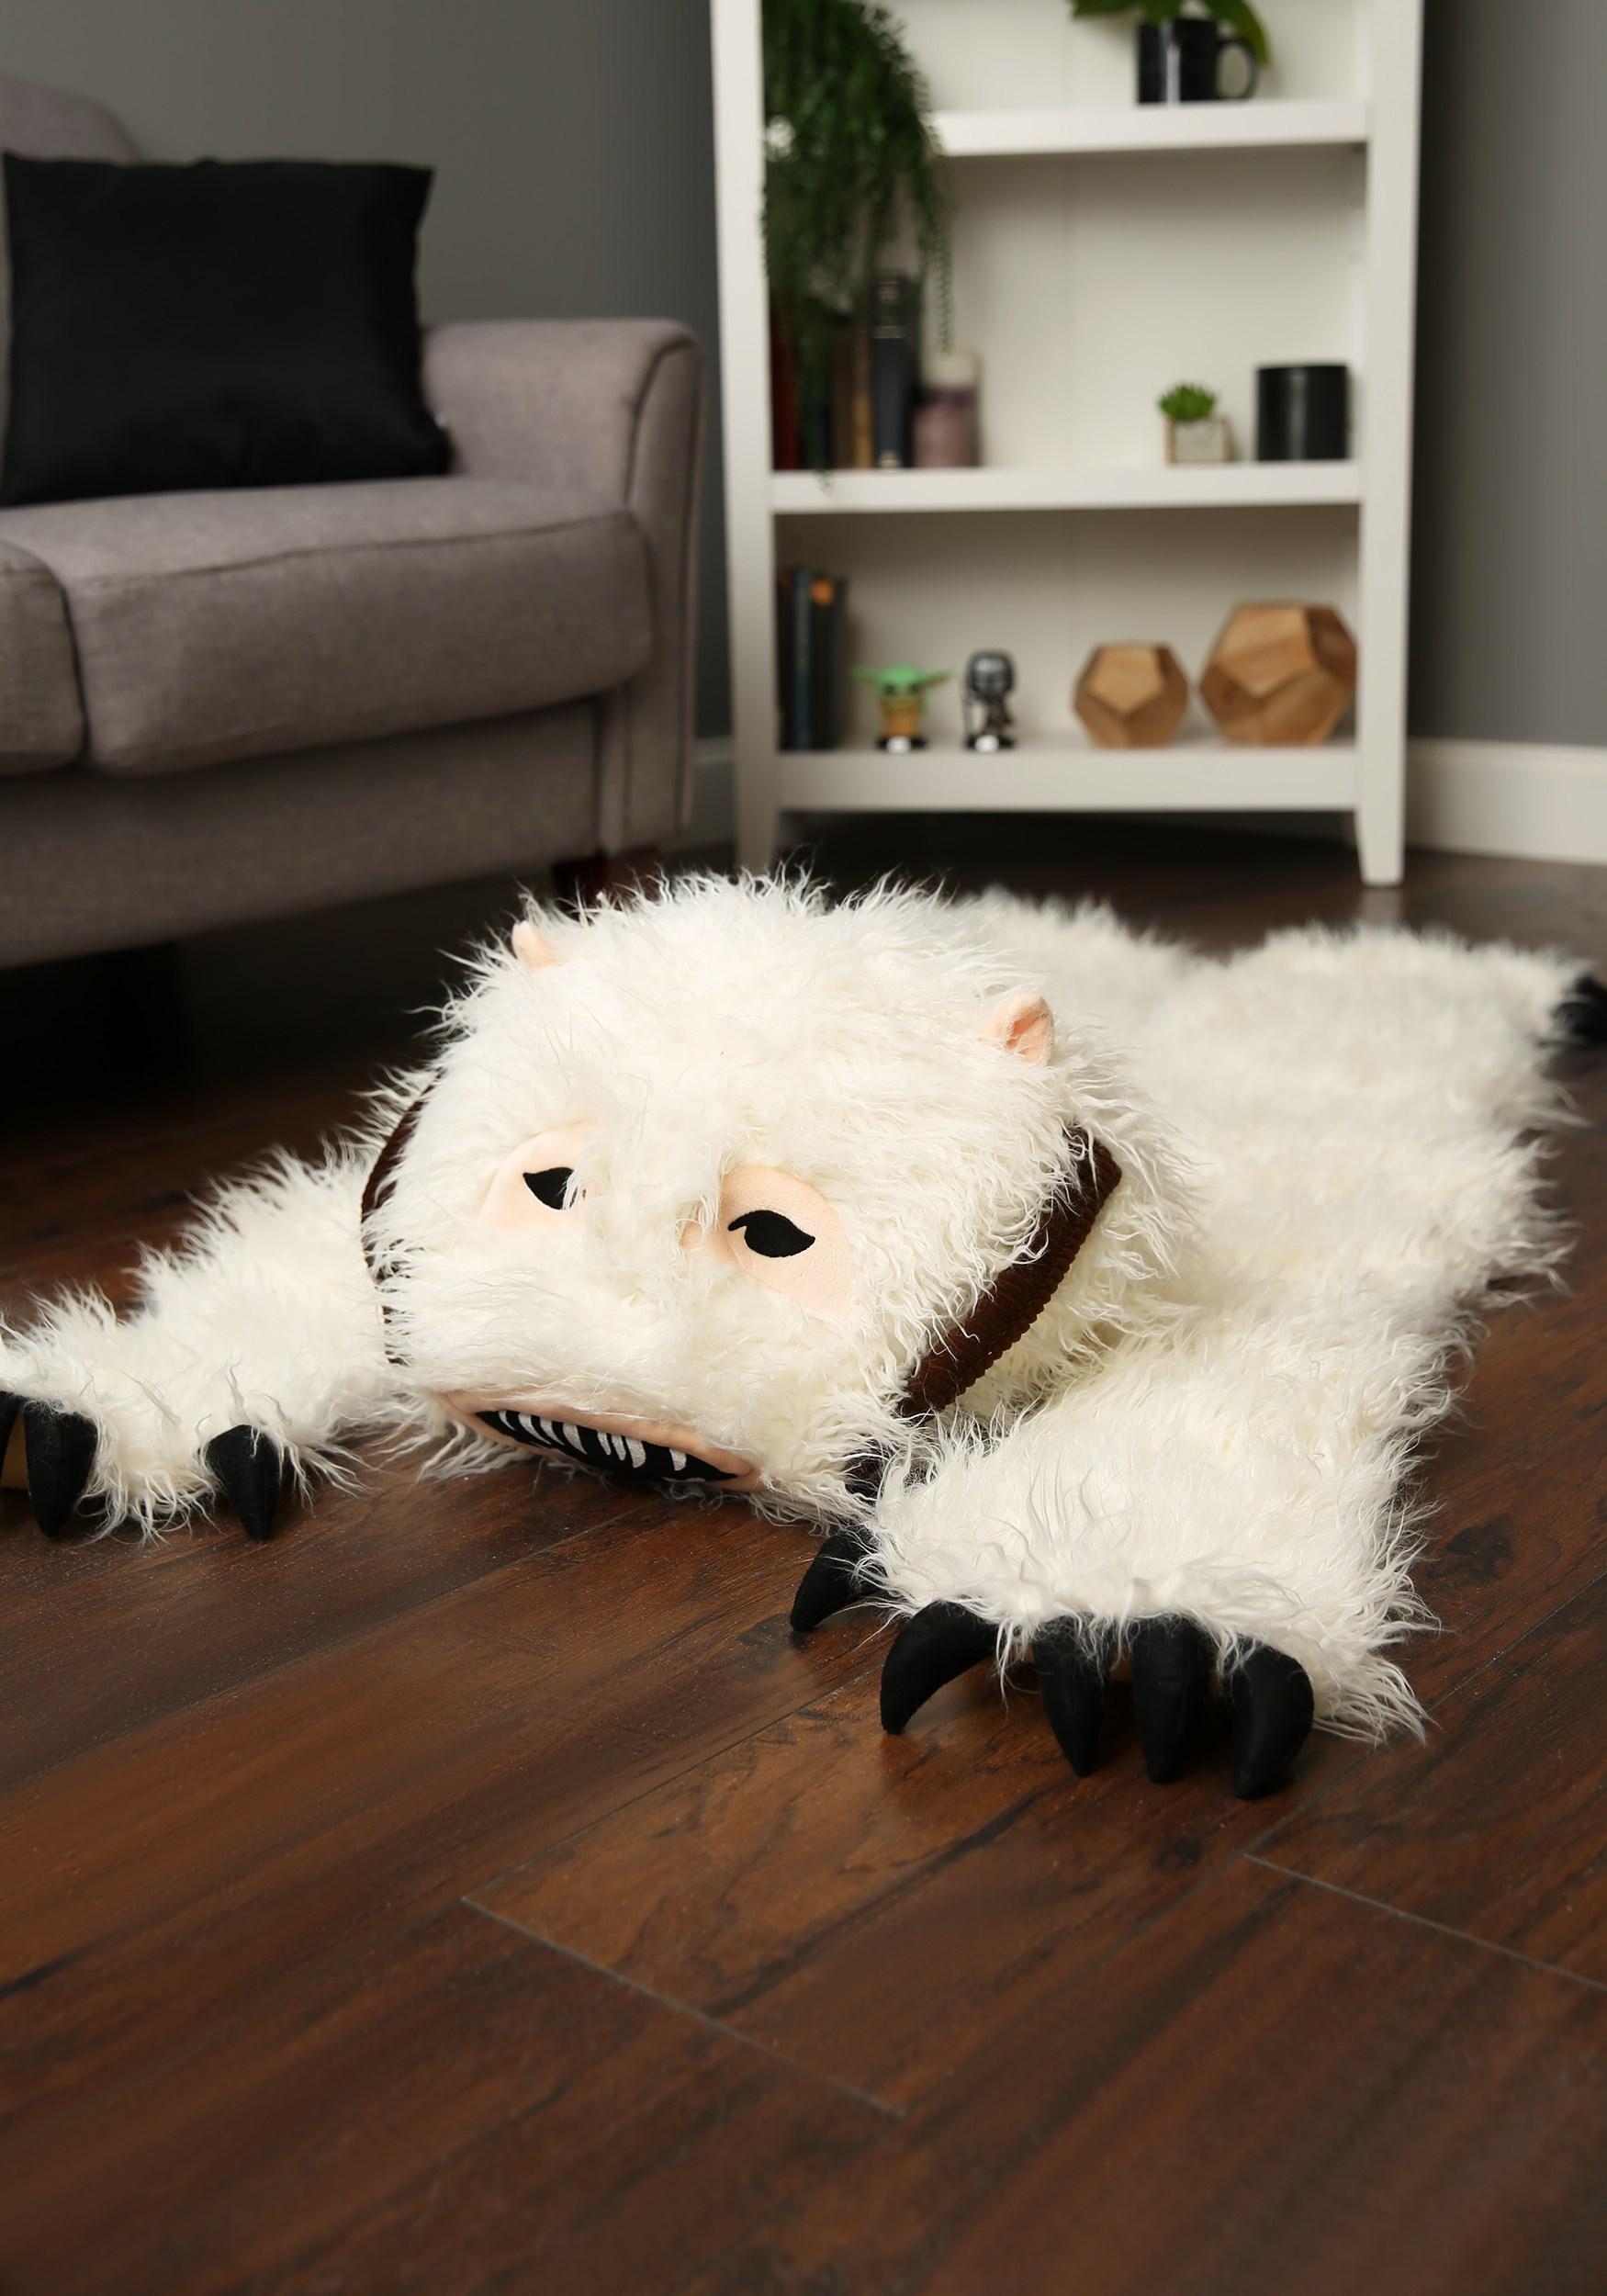 Wampa rug hugging the floor.